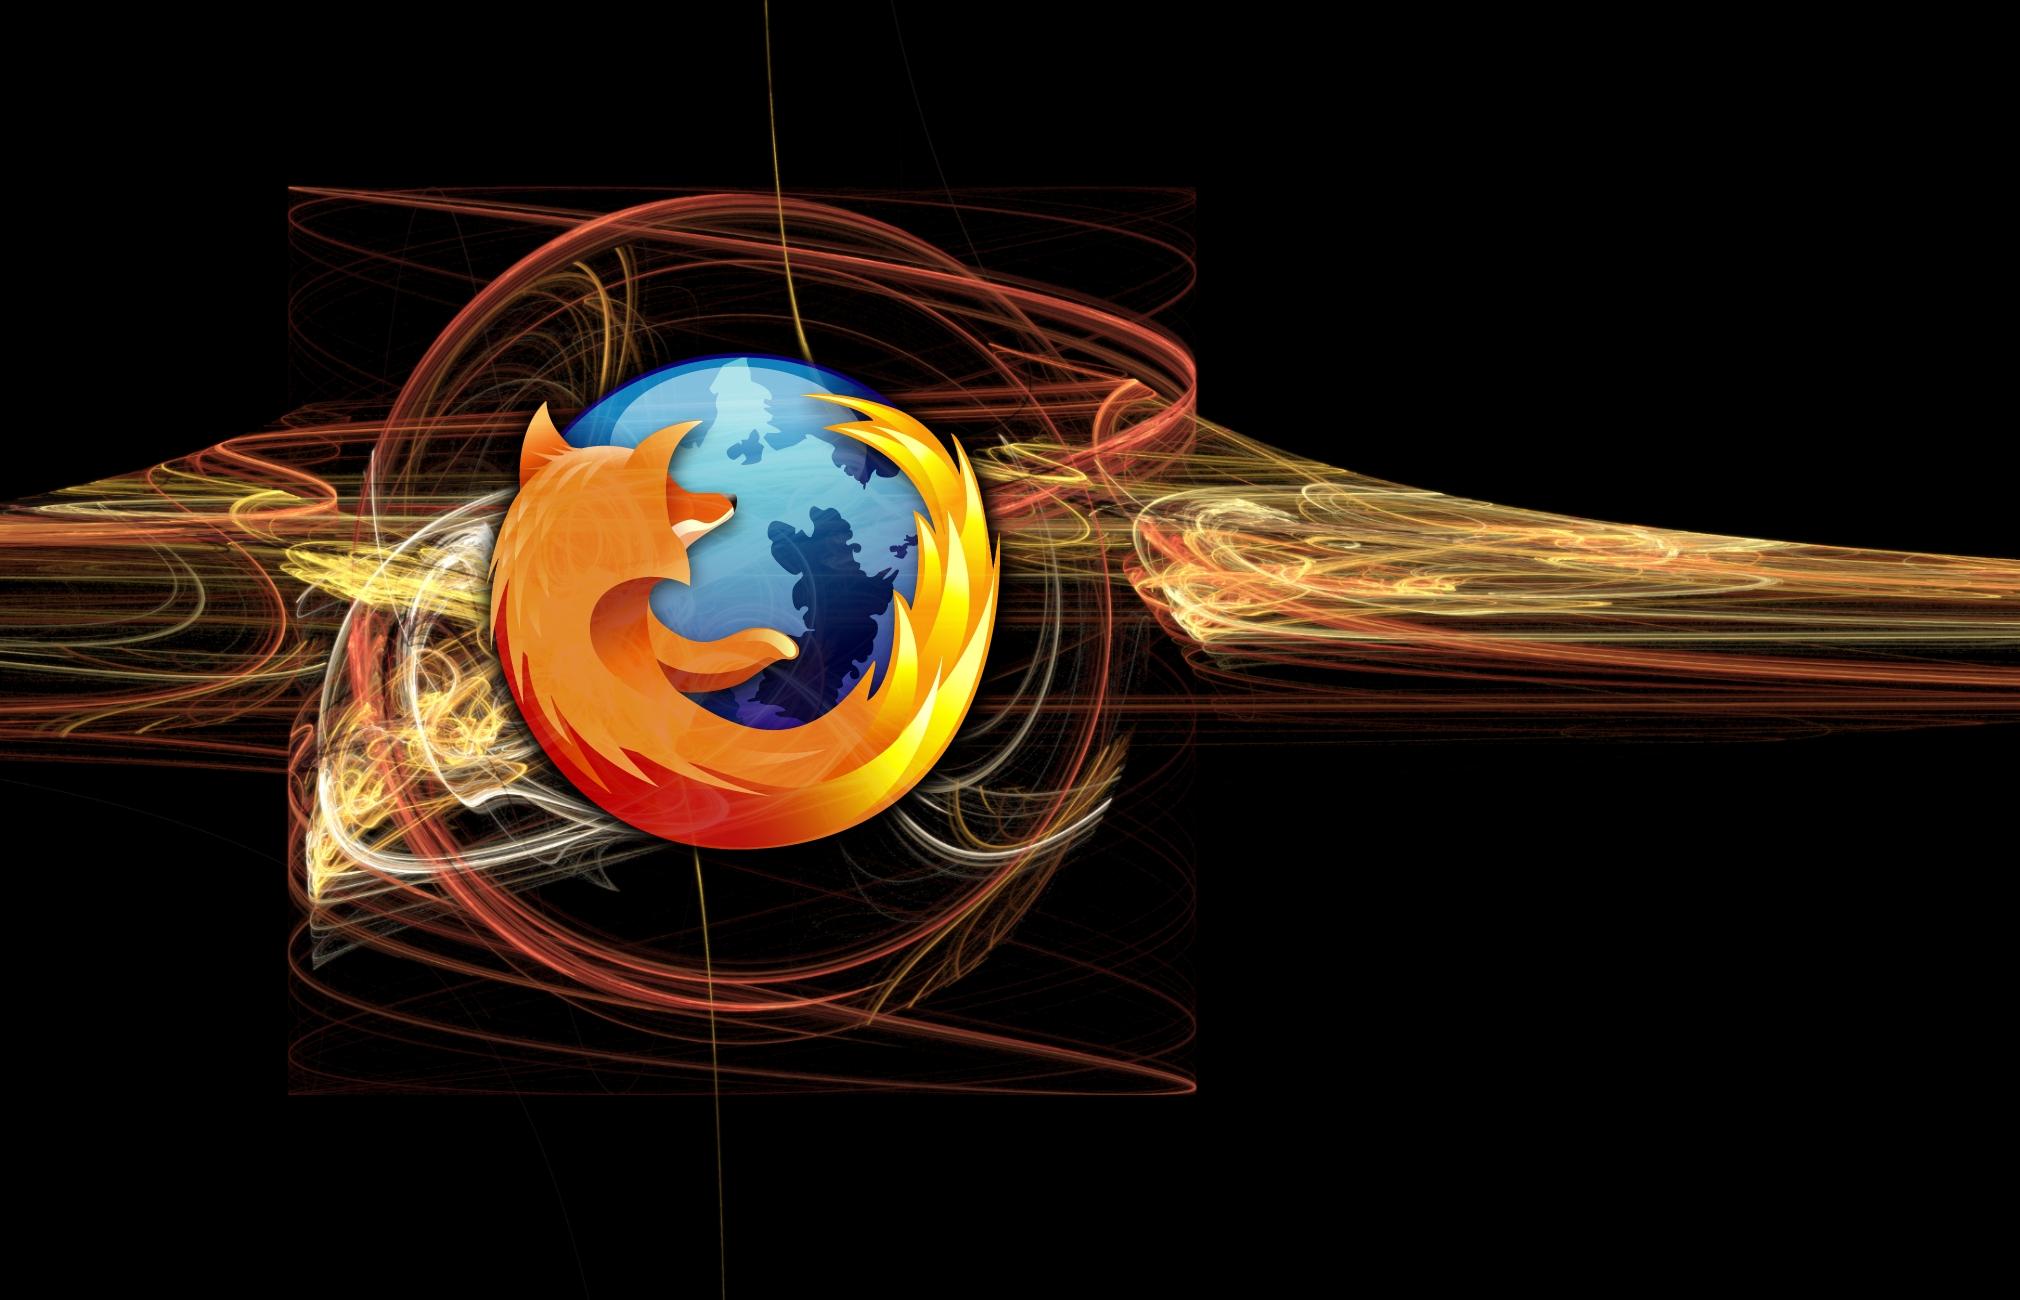 50 How To Change Firefox Wallpaper On Wallpapersafari